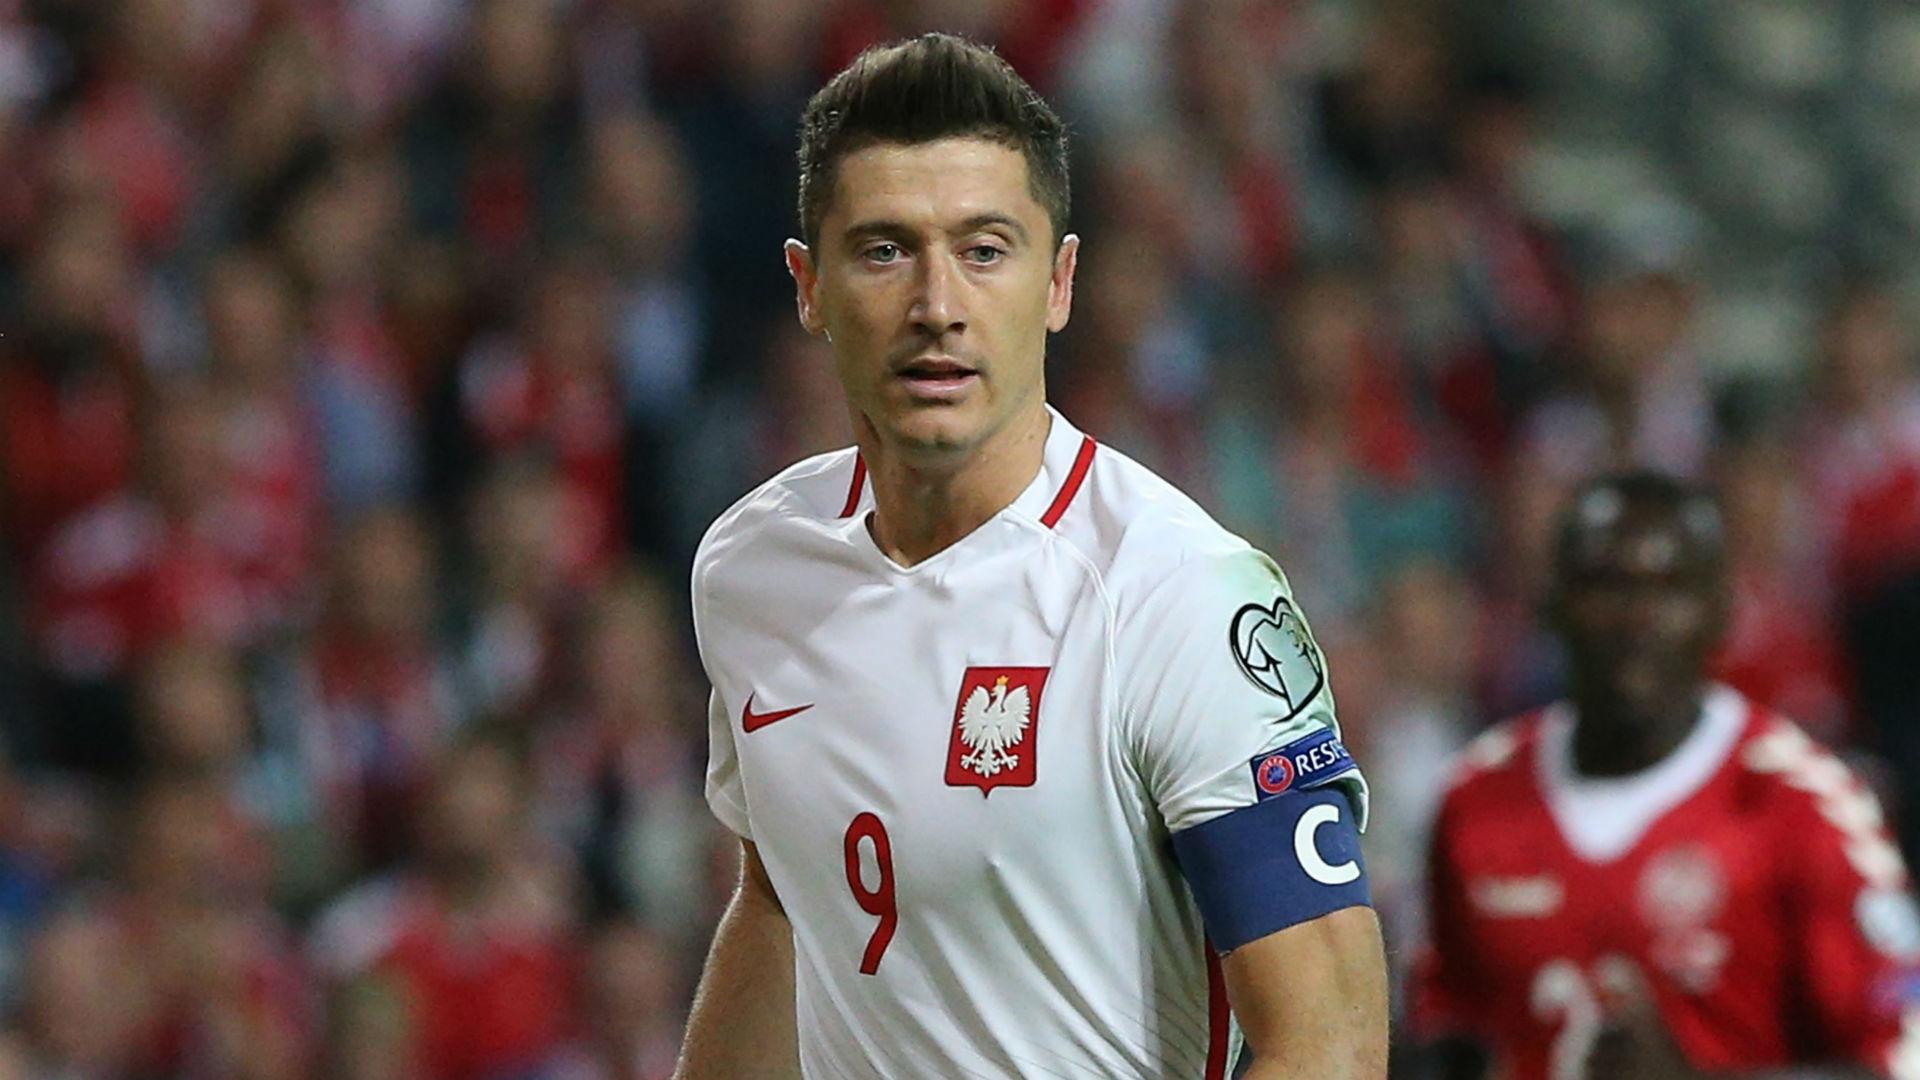 info for 2b7b8 7deb9 Lewandowski sets an example - Nawalka talks up Poland star ...